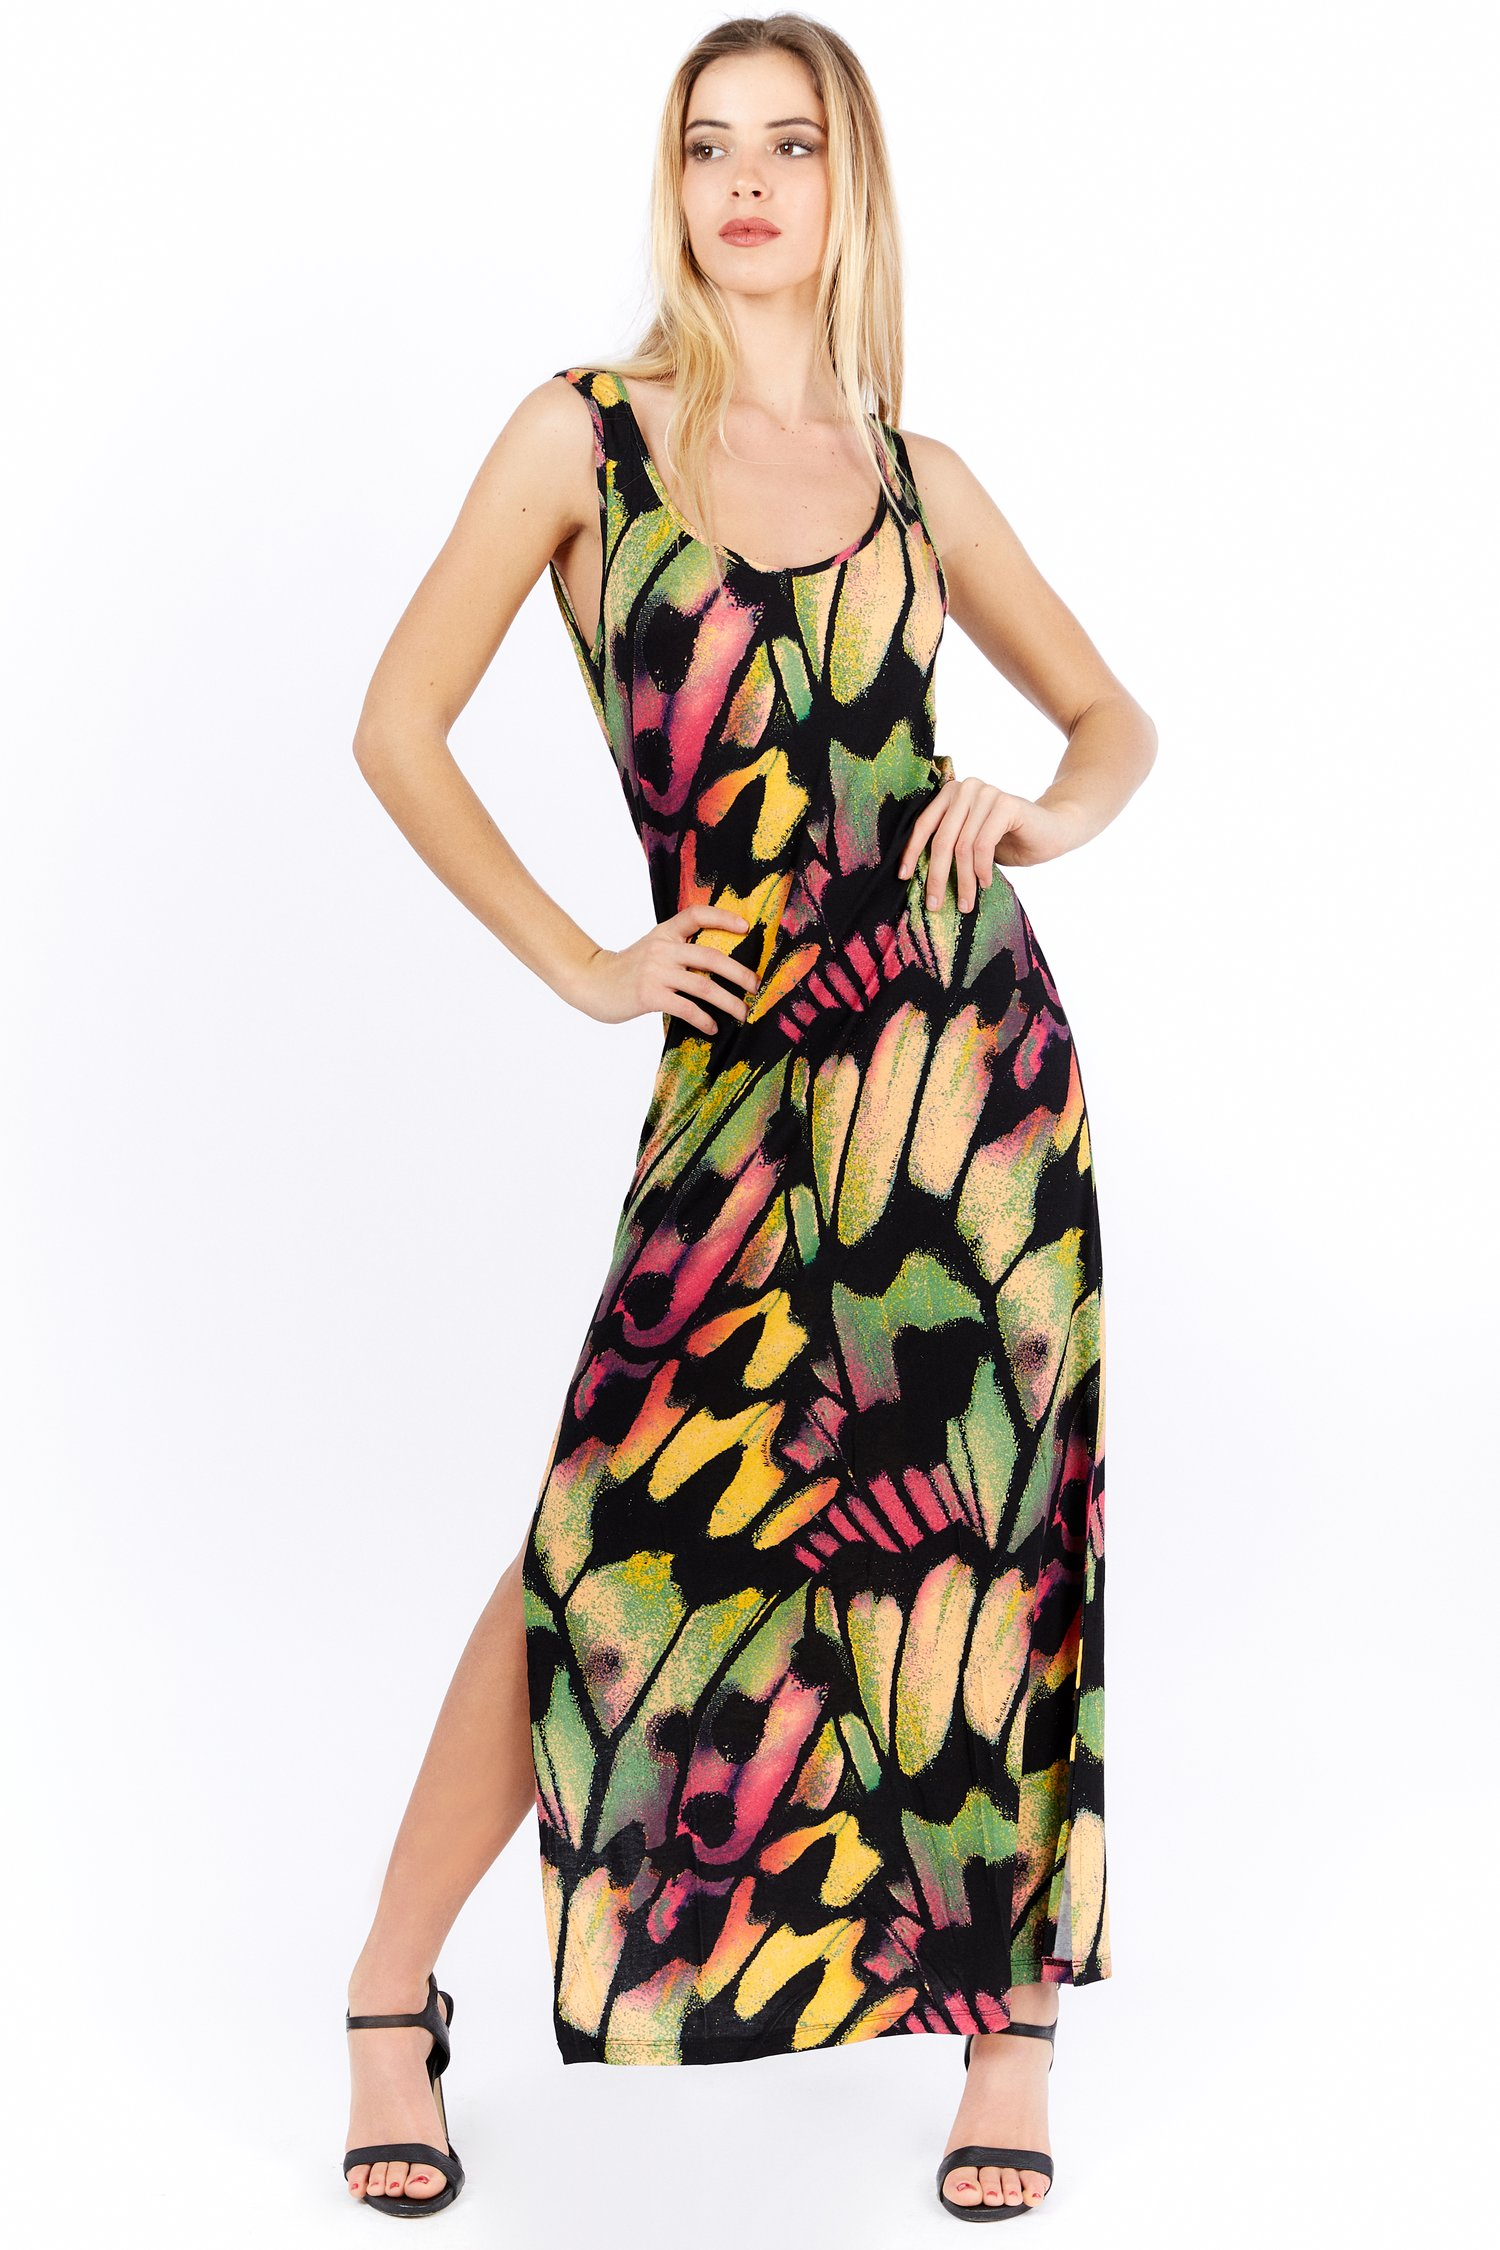 PRINTED JERSEY TANK TOP LONG DRESS - Farfalle Arancio